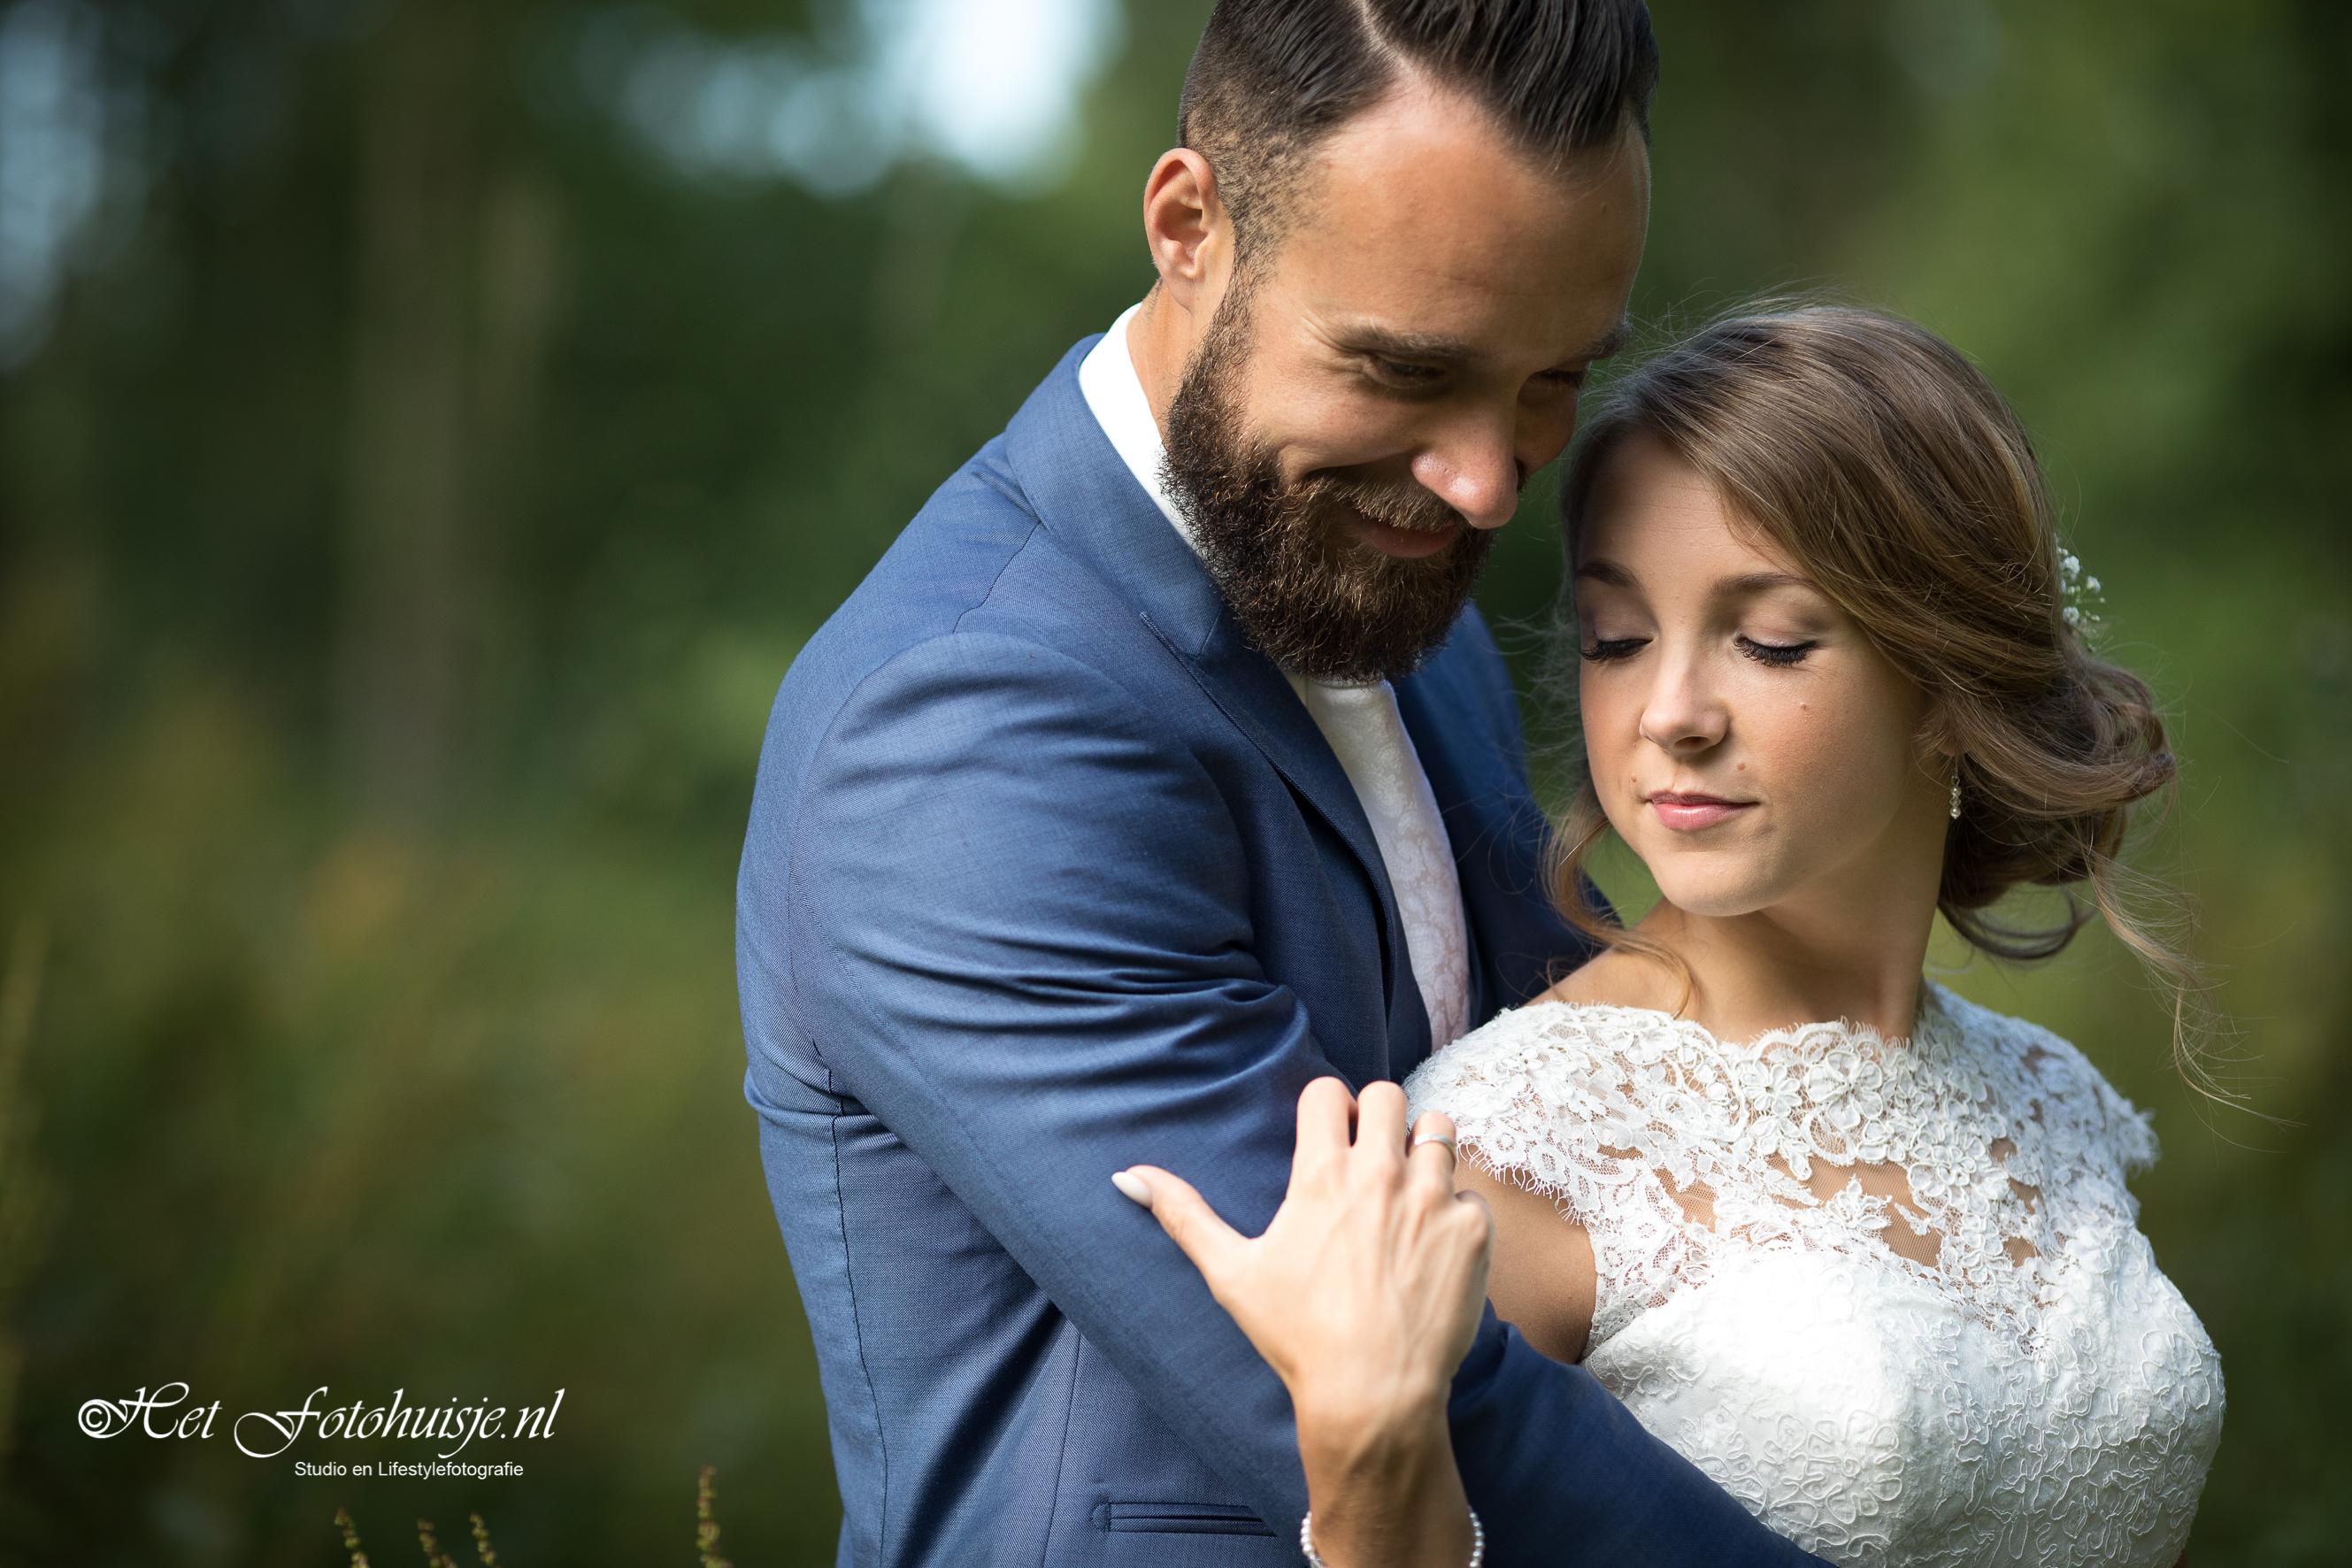 Bruiloft Dennis en Mariska 28-06-2017 Dronten